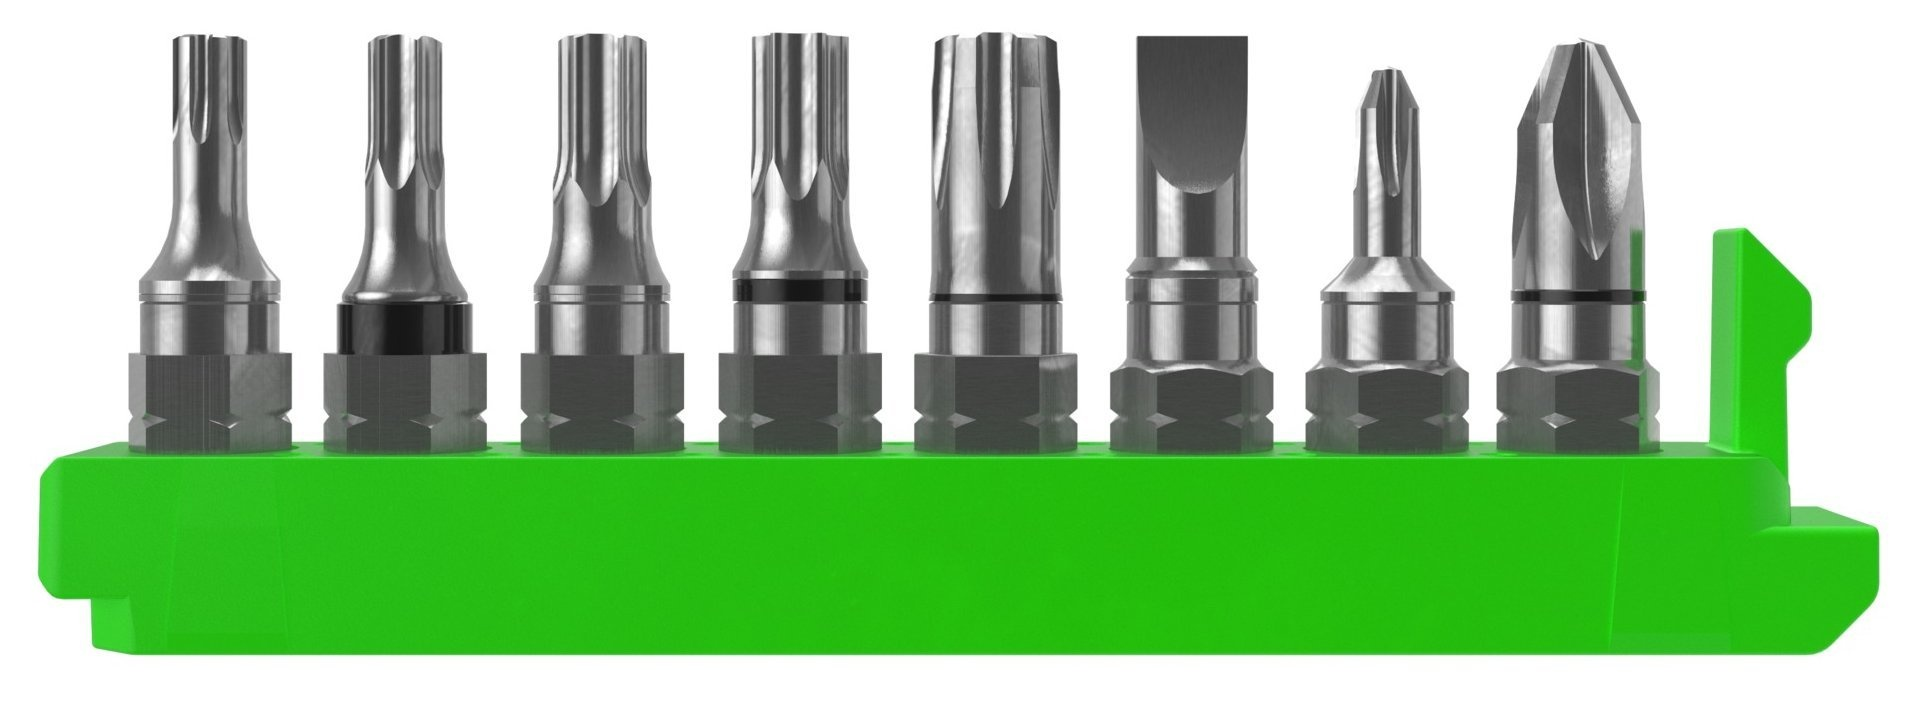 Syncros Greenslide Spare Bit 8 stk. TORX